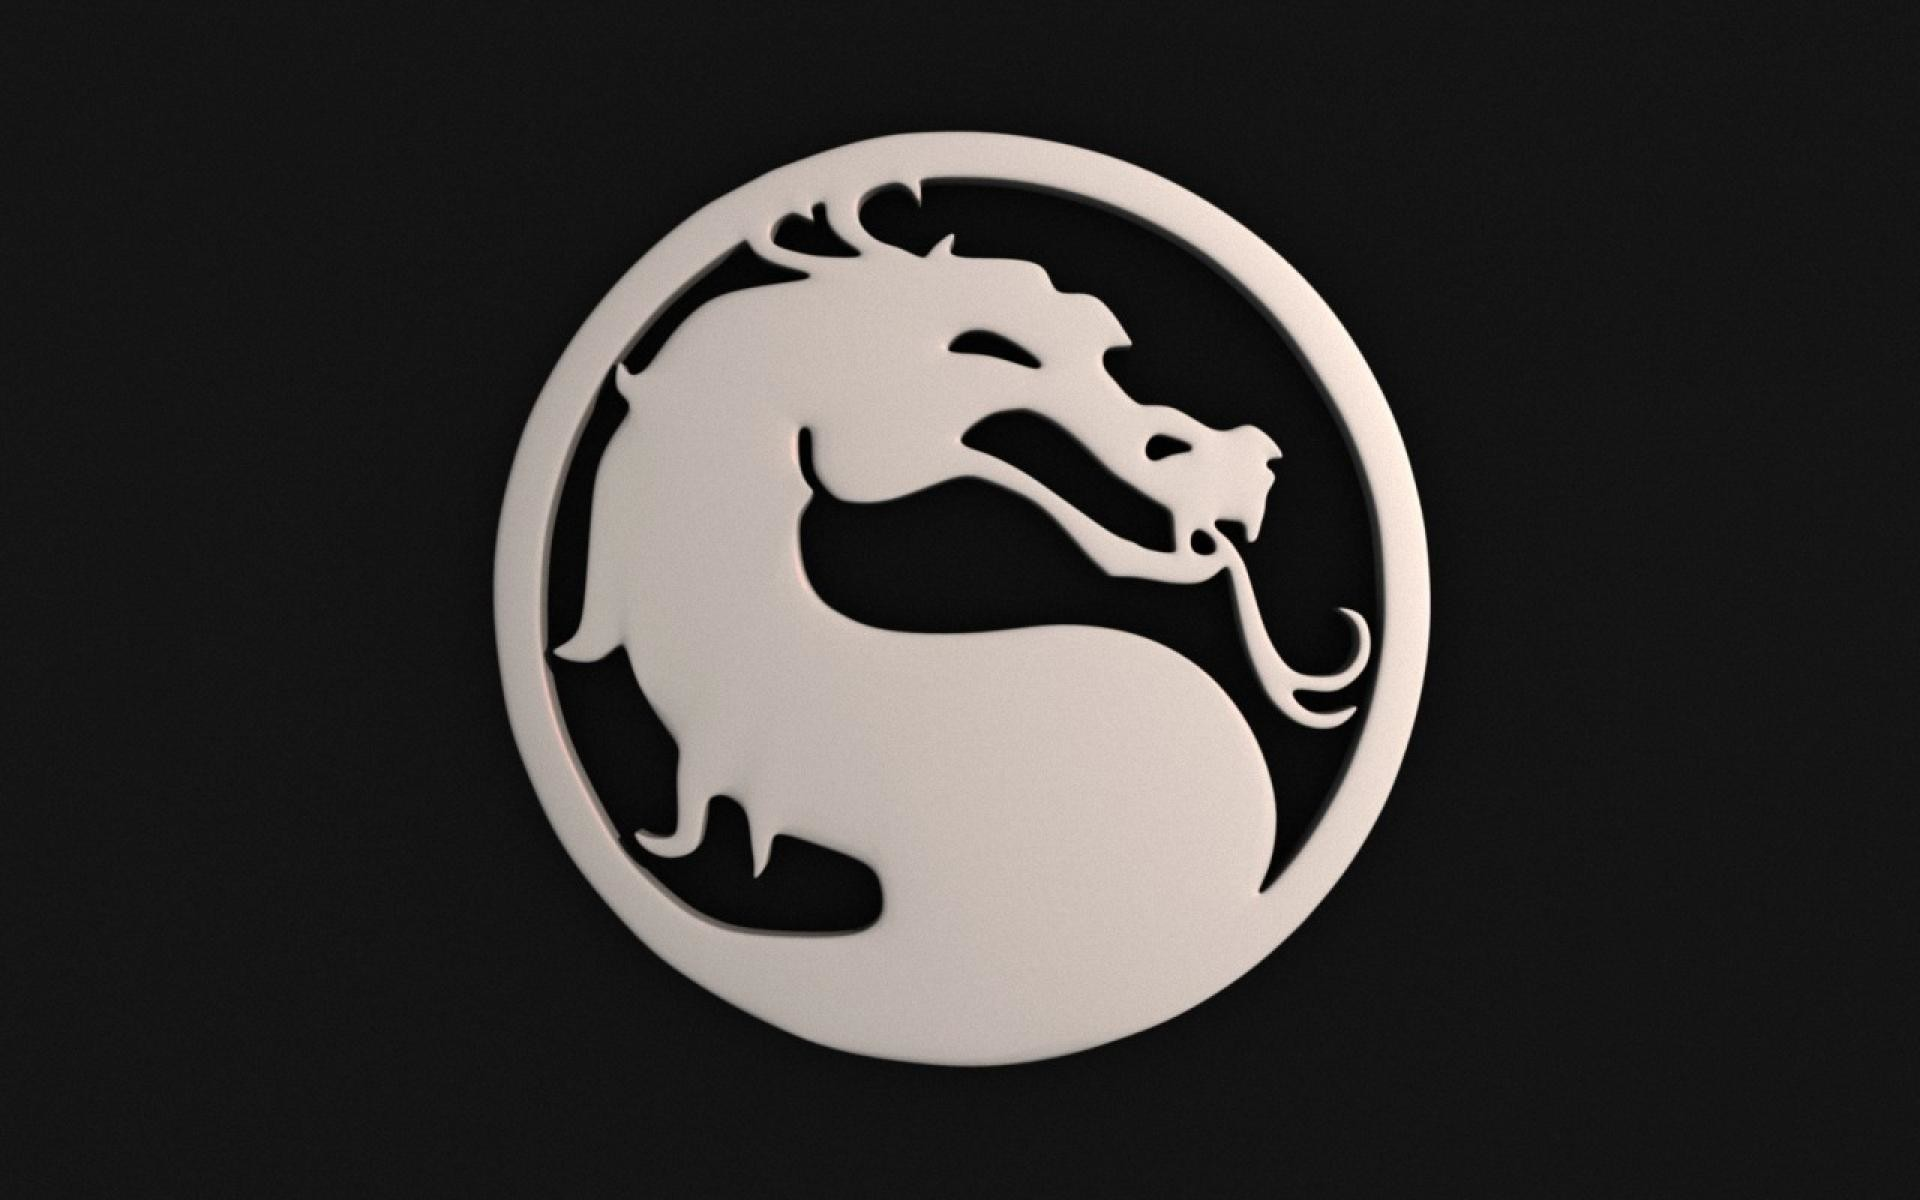 Mortal Kombat Logo wallpaper 174317